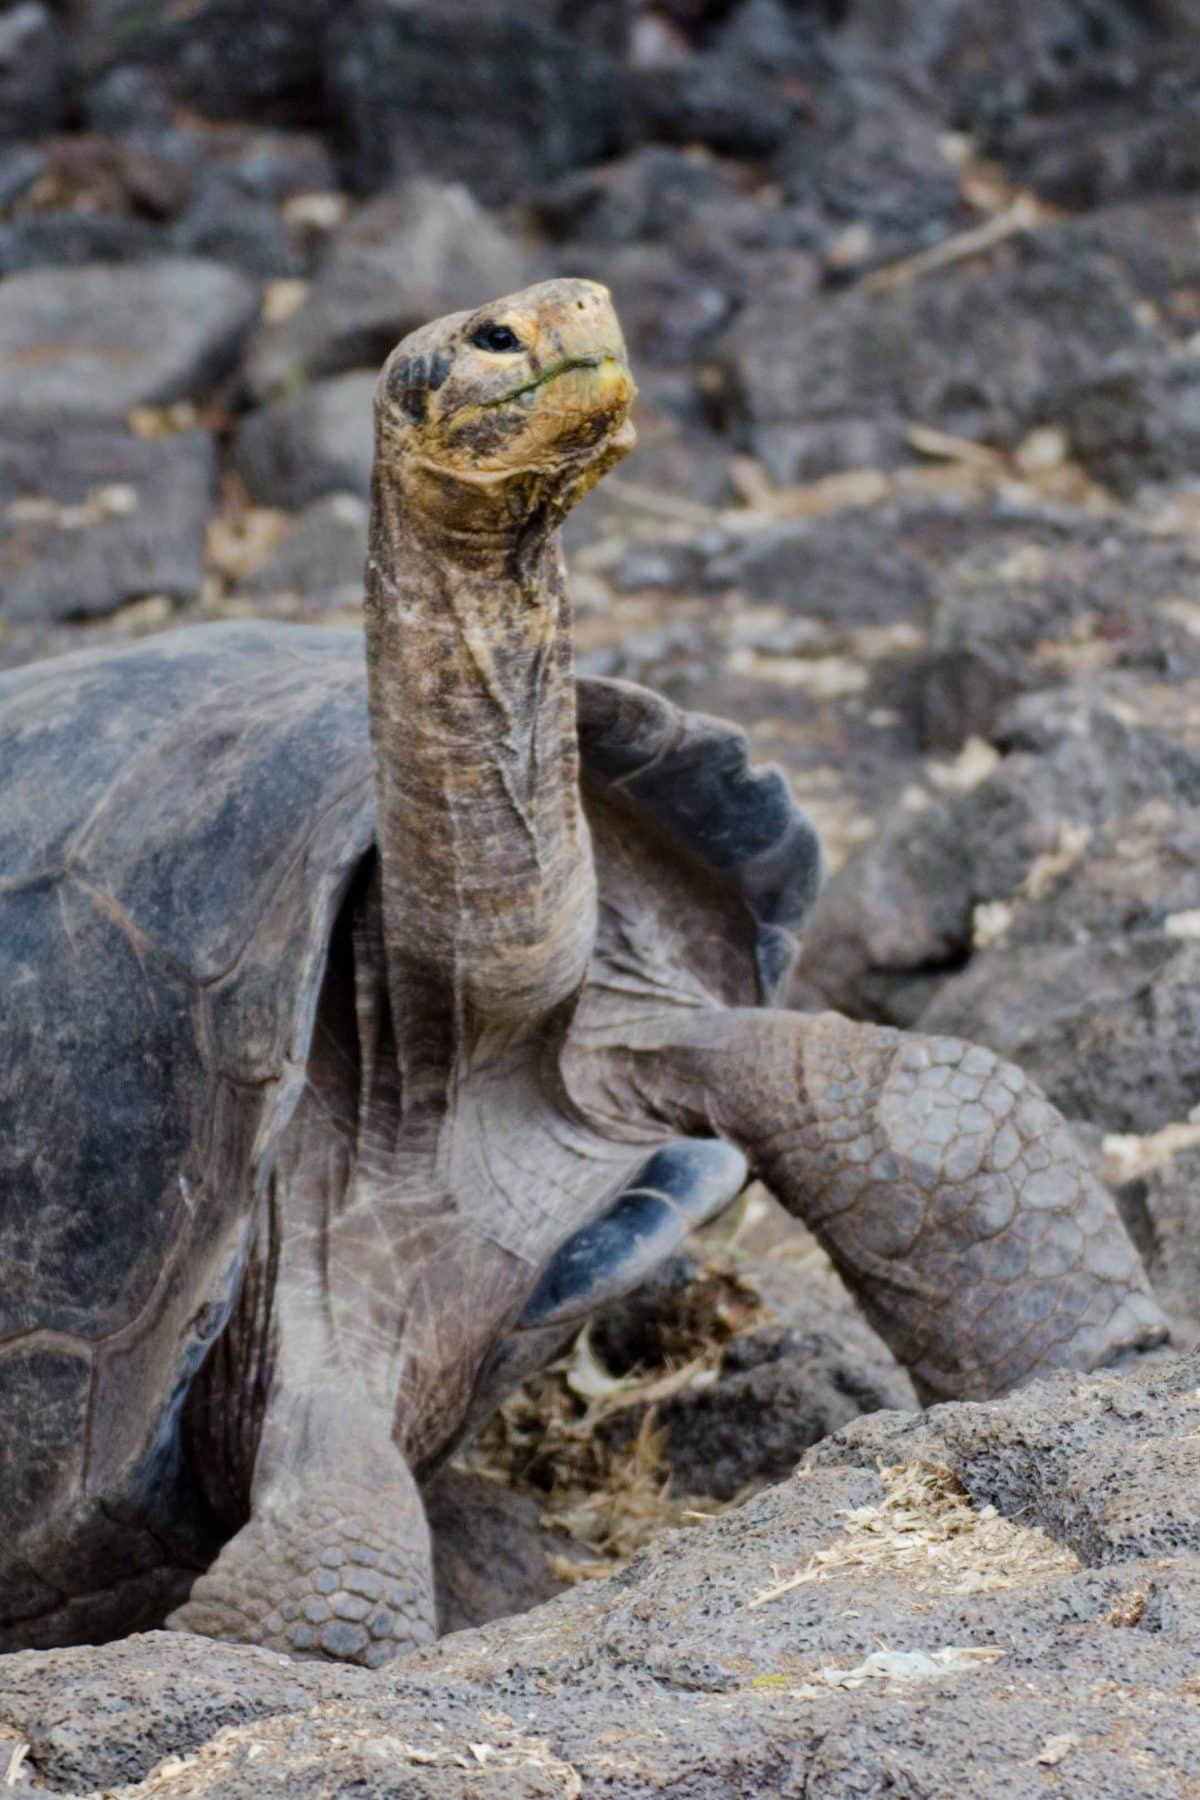 Tortoises at the Charles Darwin Center, Santa Cruz Island, Galapagos | © Angela Drake